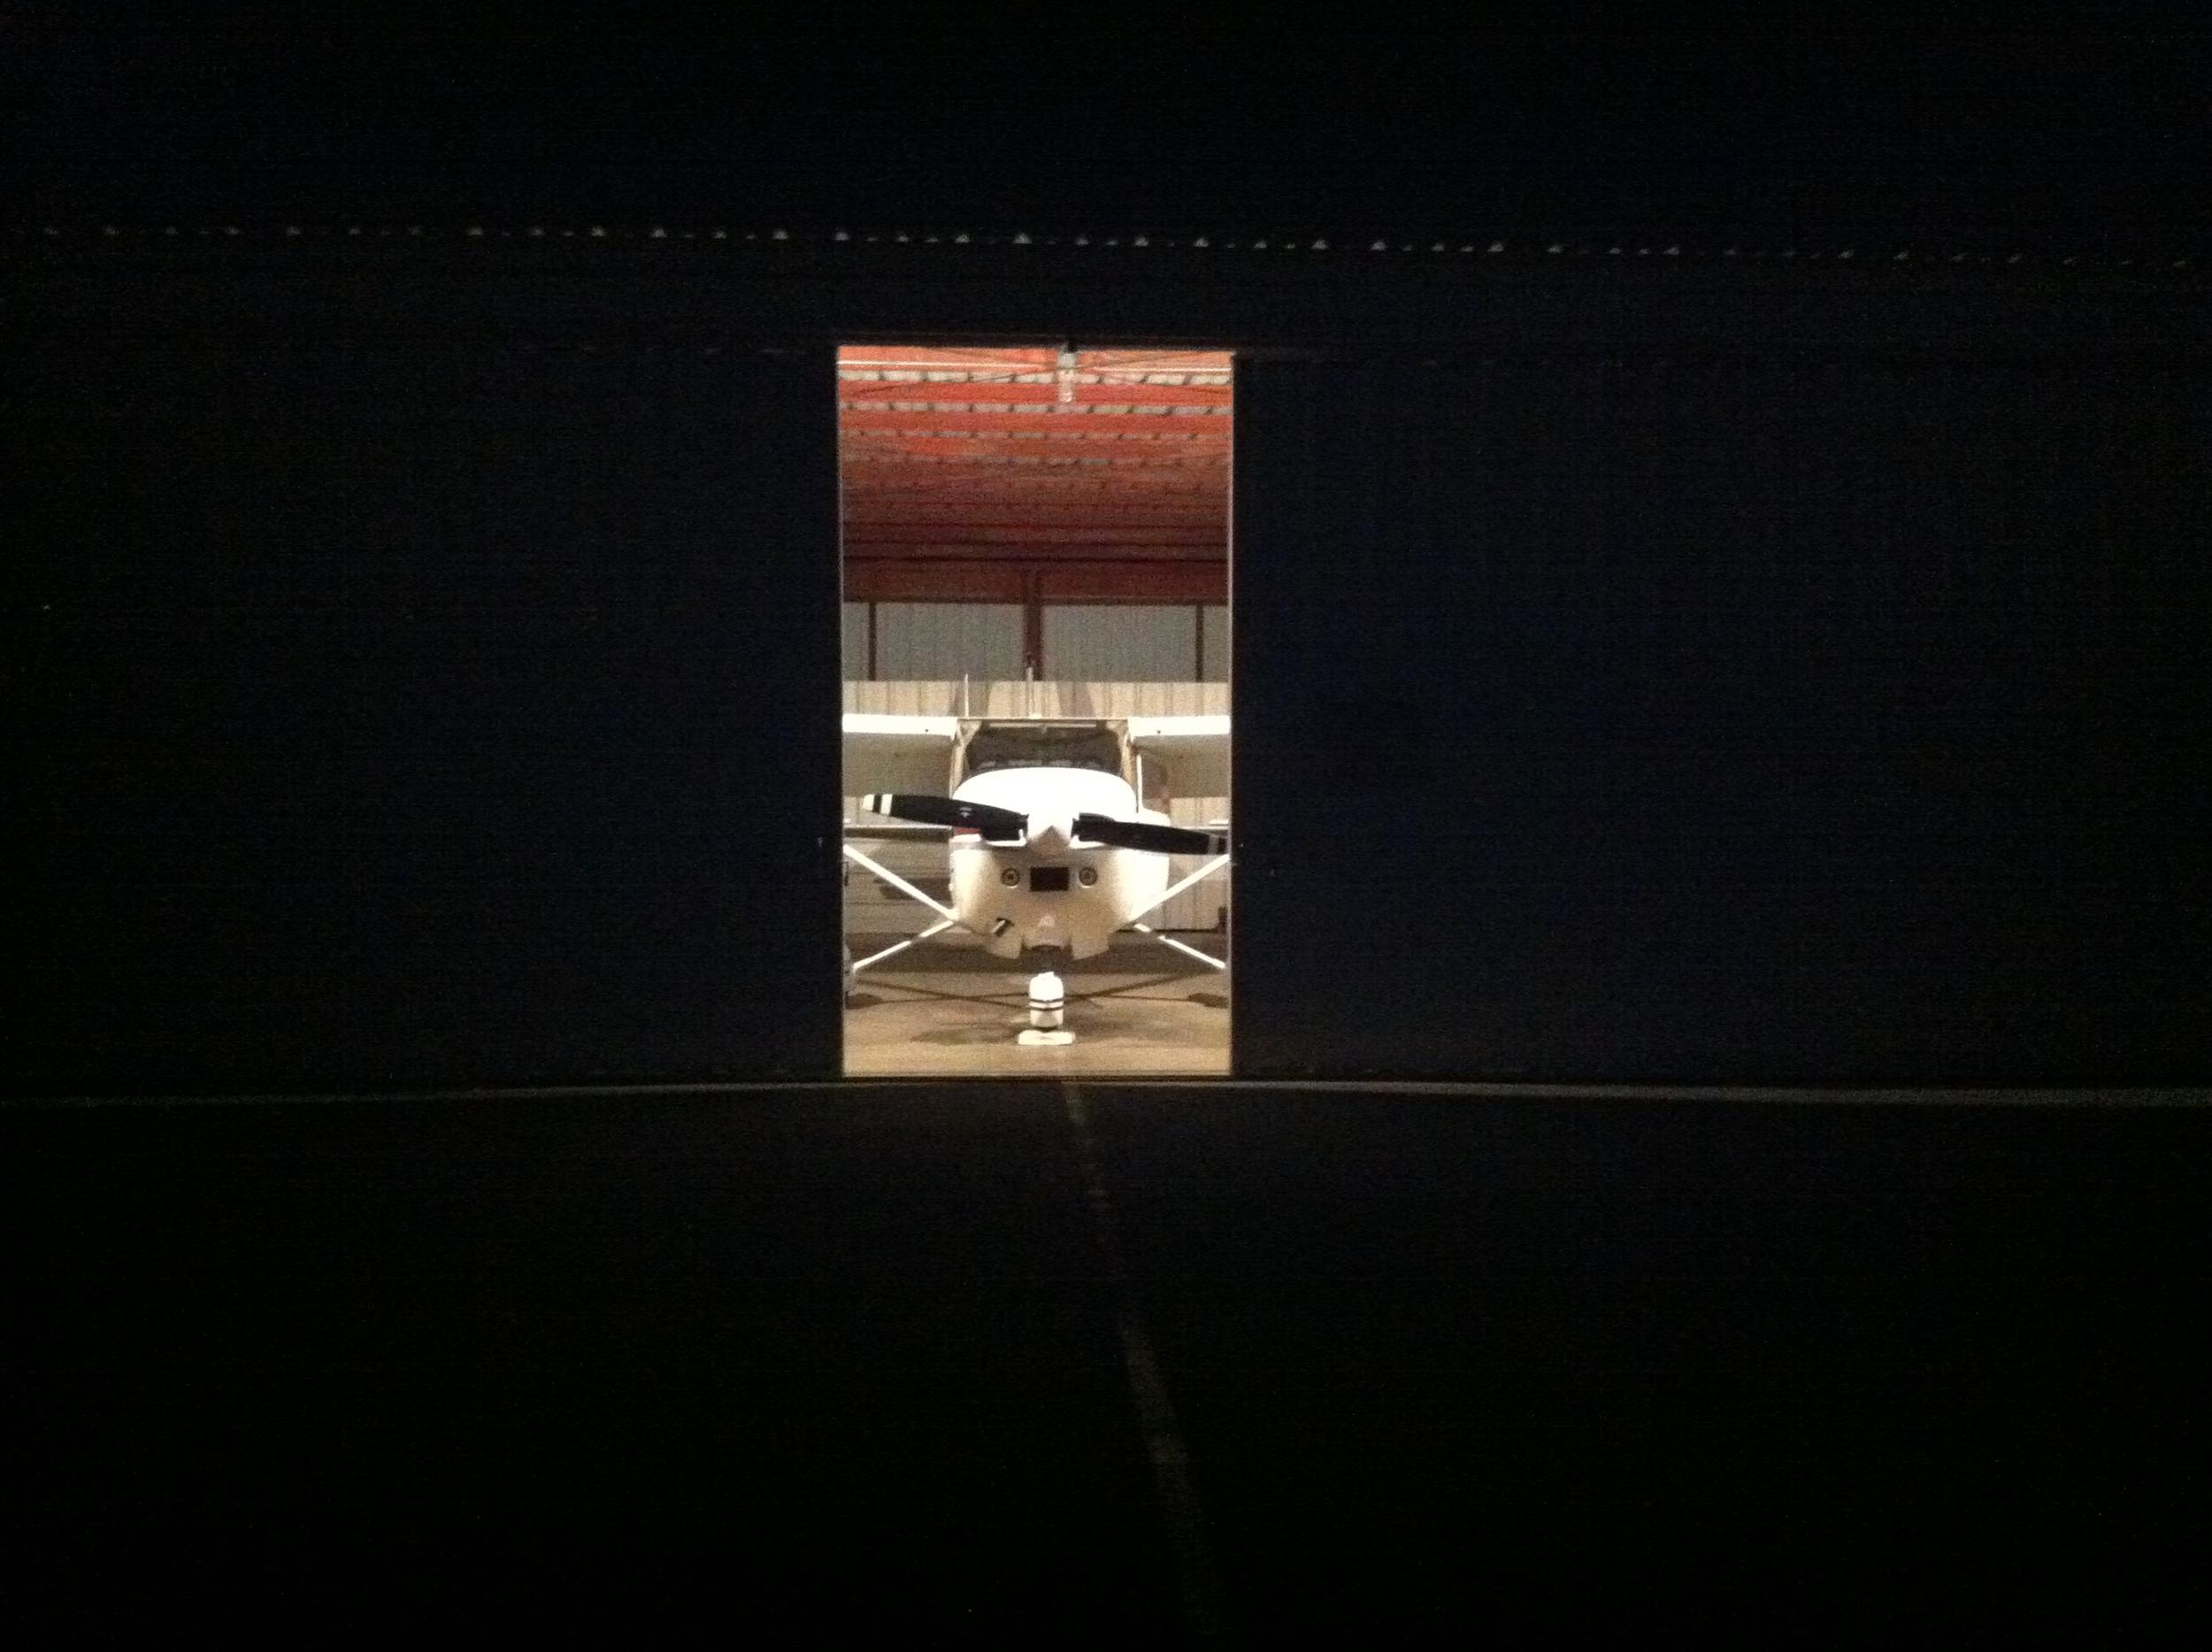 Night Currency Flight